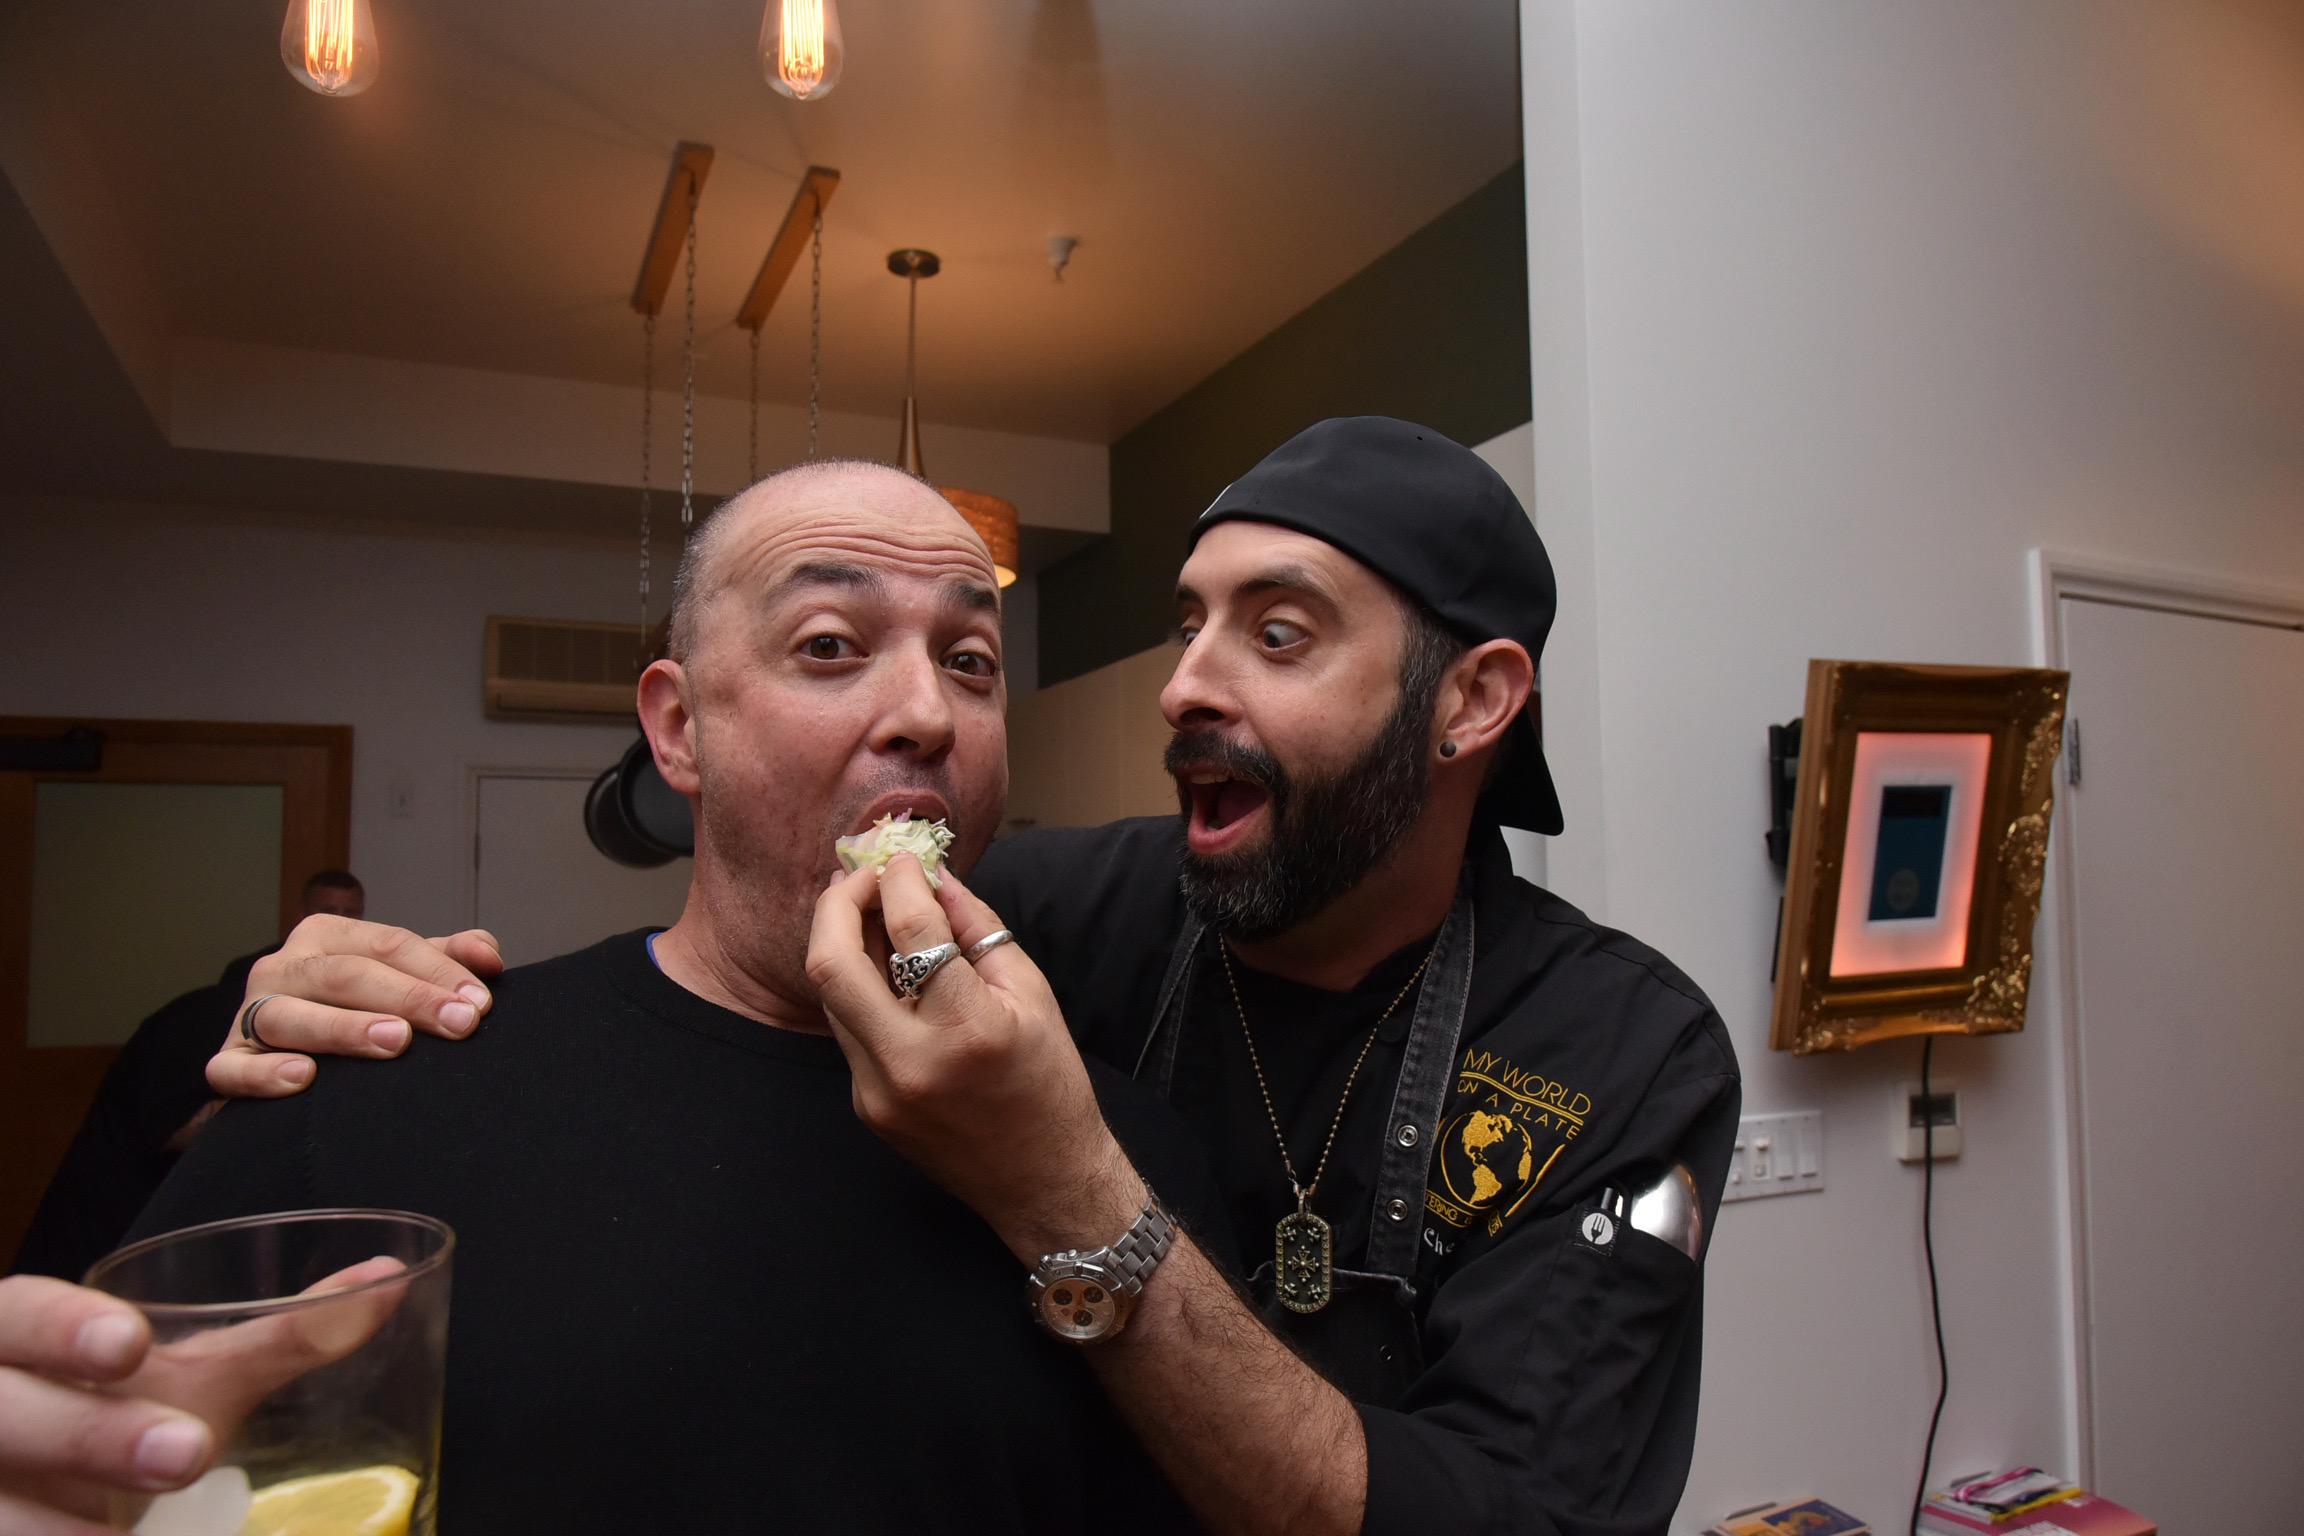 Chefs Keven Lee & Arturo Quesada, Featuring Carolina Gonzalez